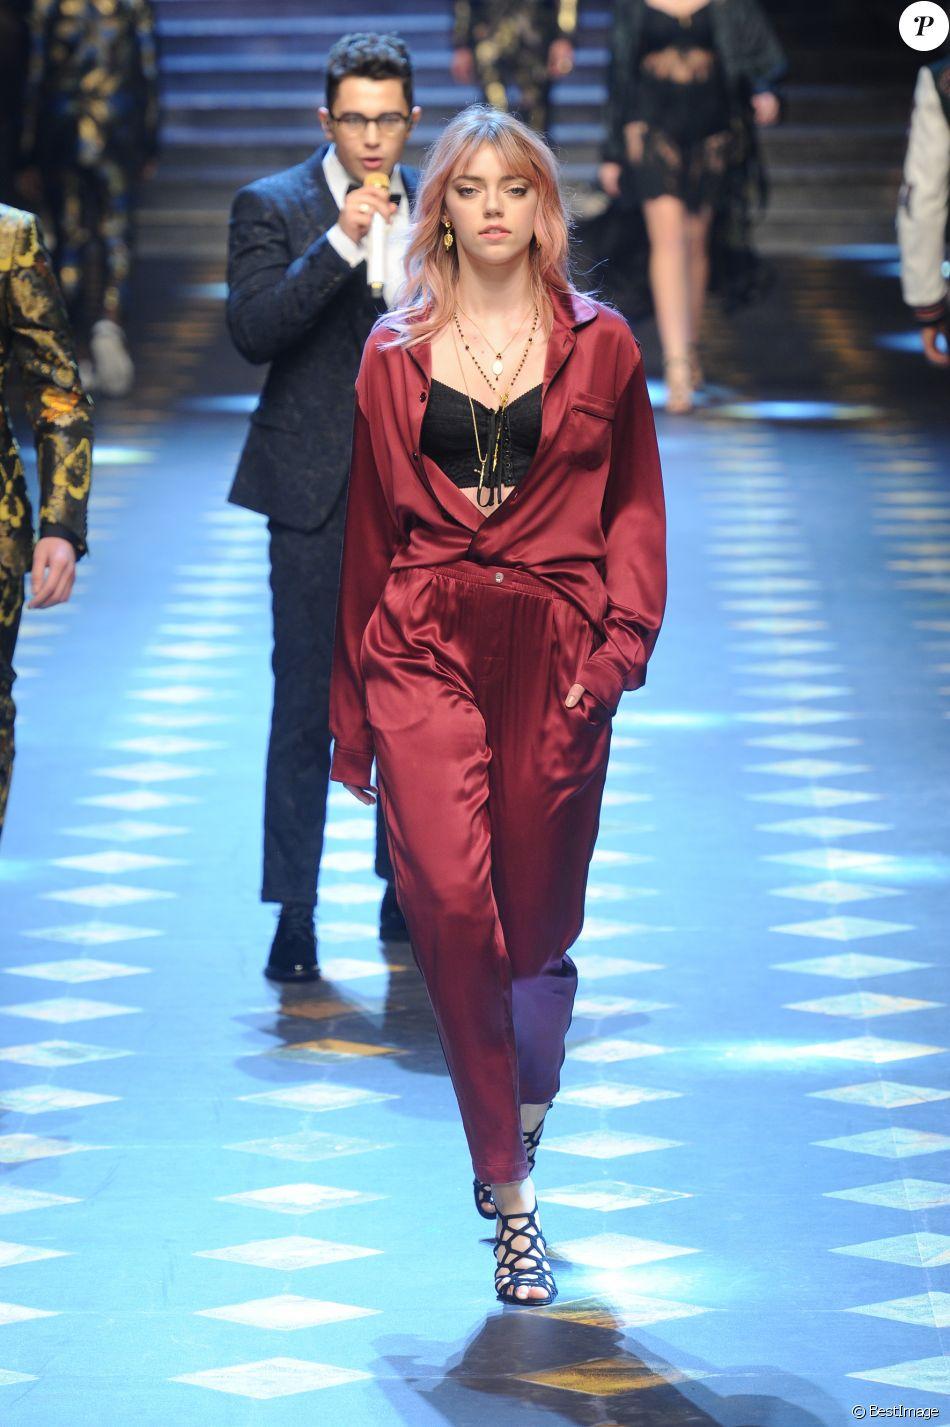 Pyper America Smith défile pour Dolce   Gabbana à la Fashion Week de Milan.  Le 14 janvier 2017. 143f2317893c